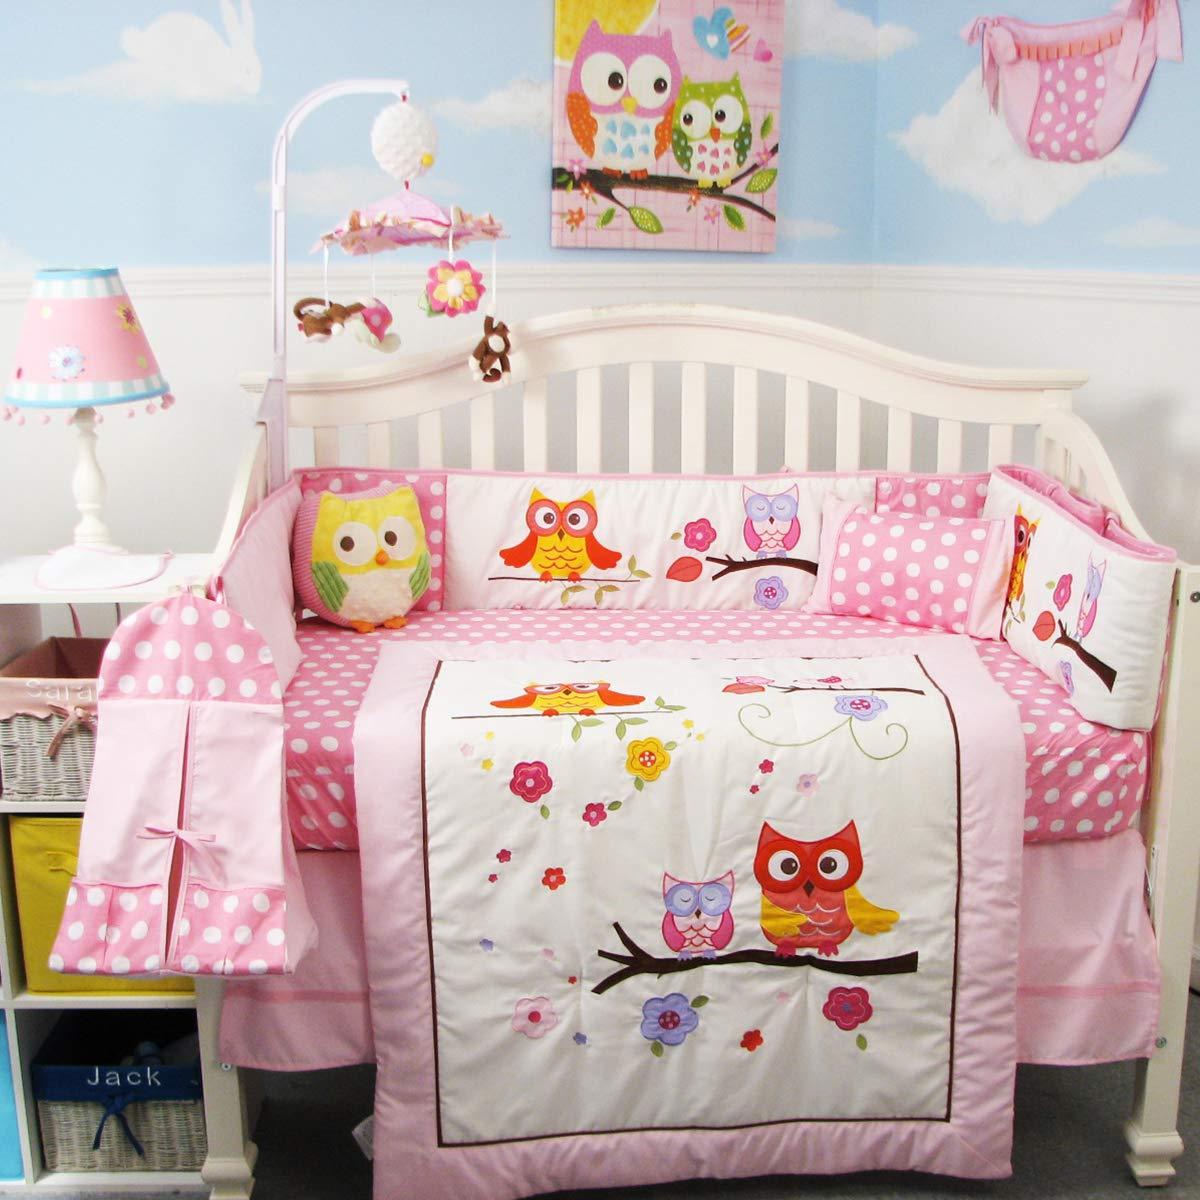 SoHo Baby Crib 10Pc Bedding Set, Pink Owl